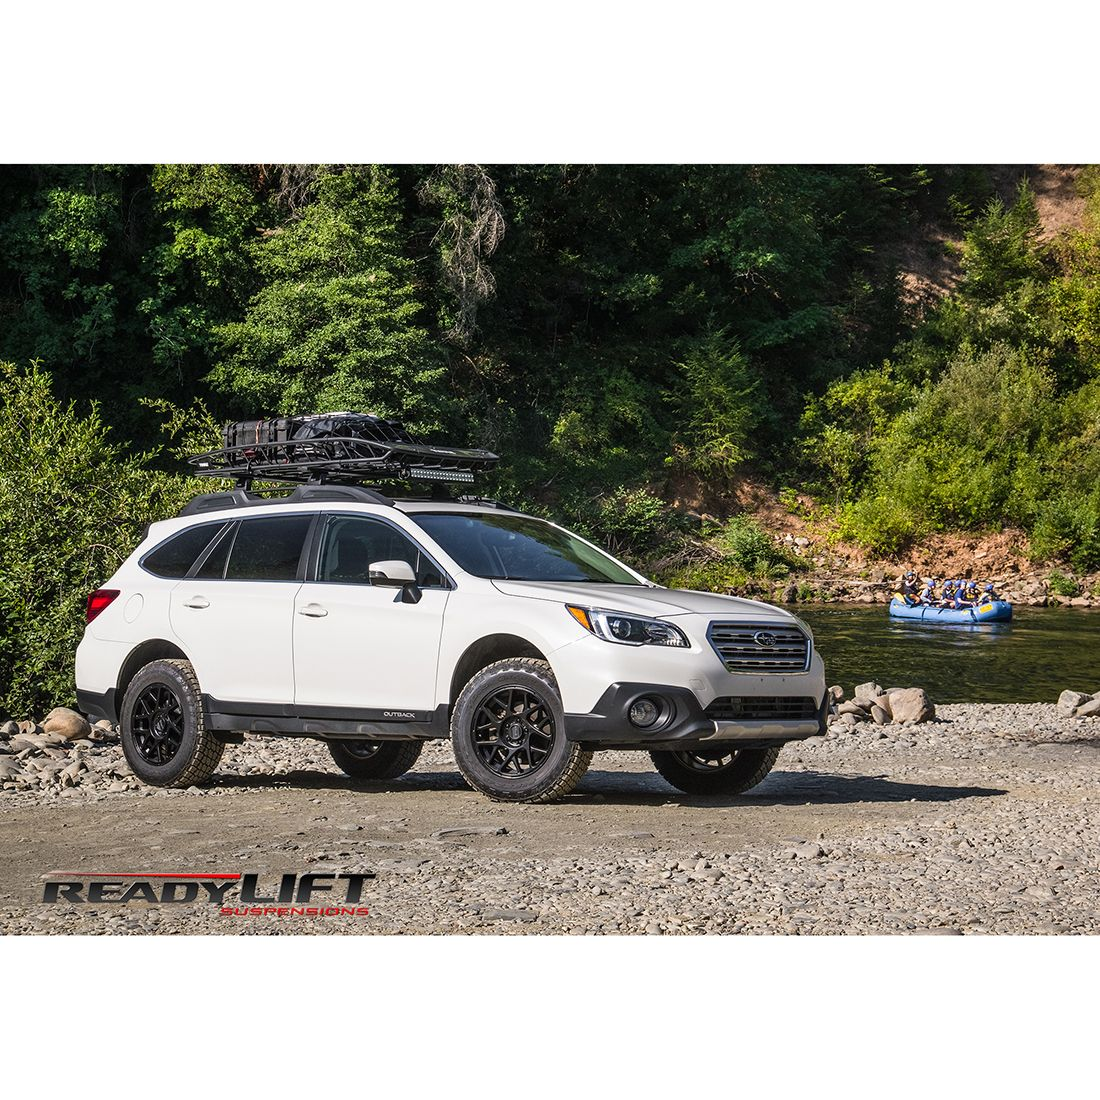 ReadyLift 69-9520 2 inch SST Subaru Outback lift kit